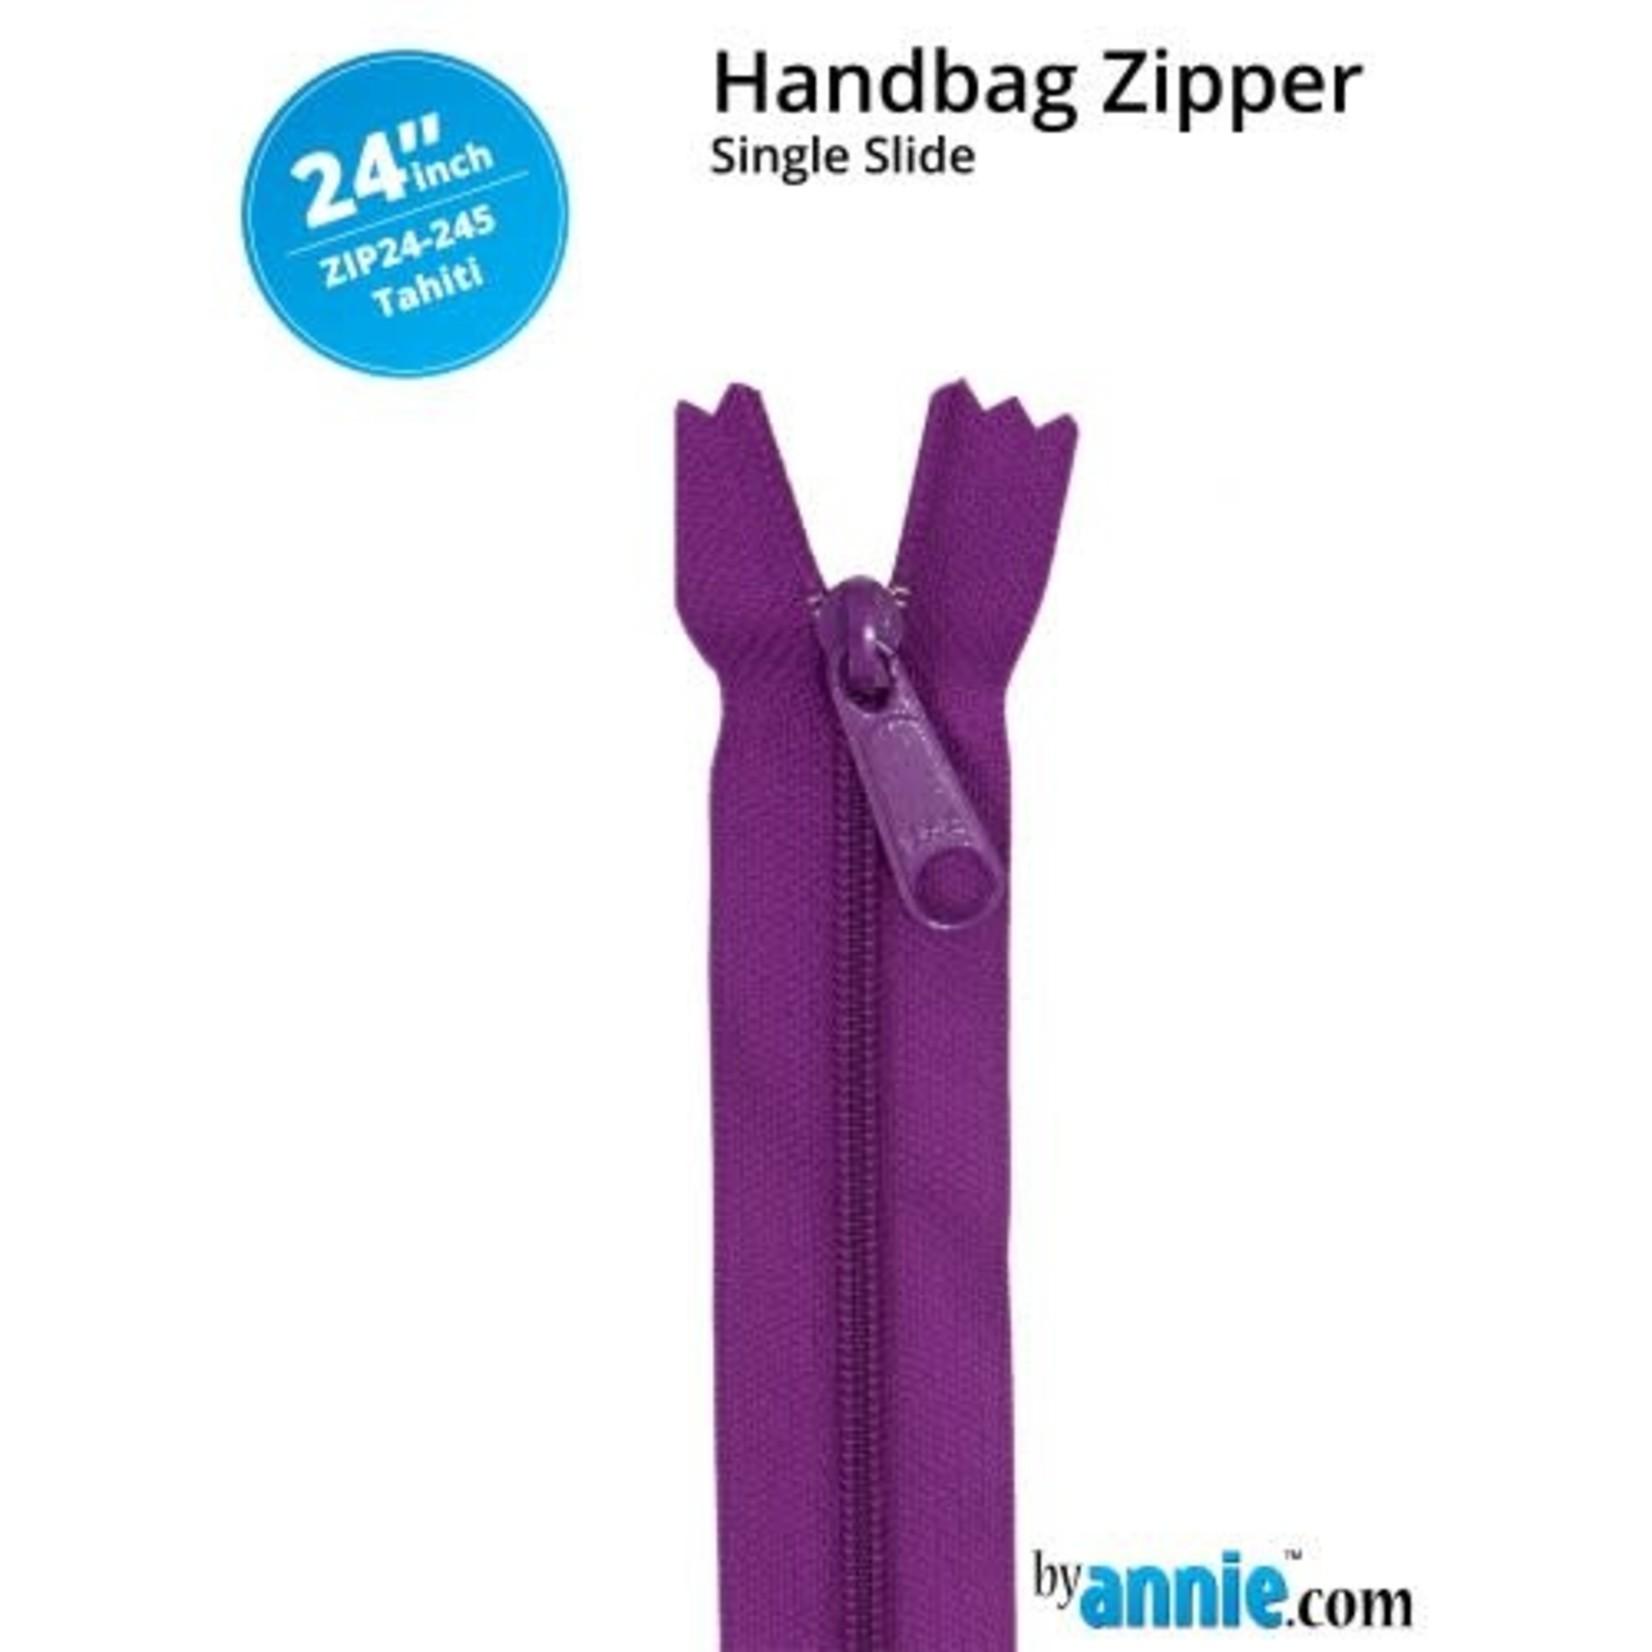 By Annie Single Slide Handbag Zipper 24'' Blue/Purple